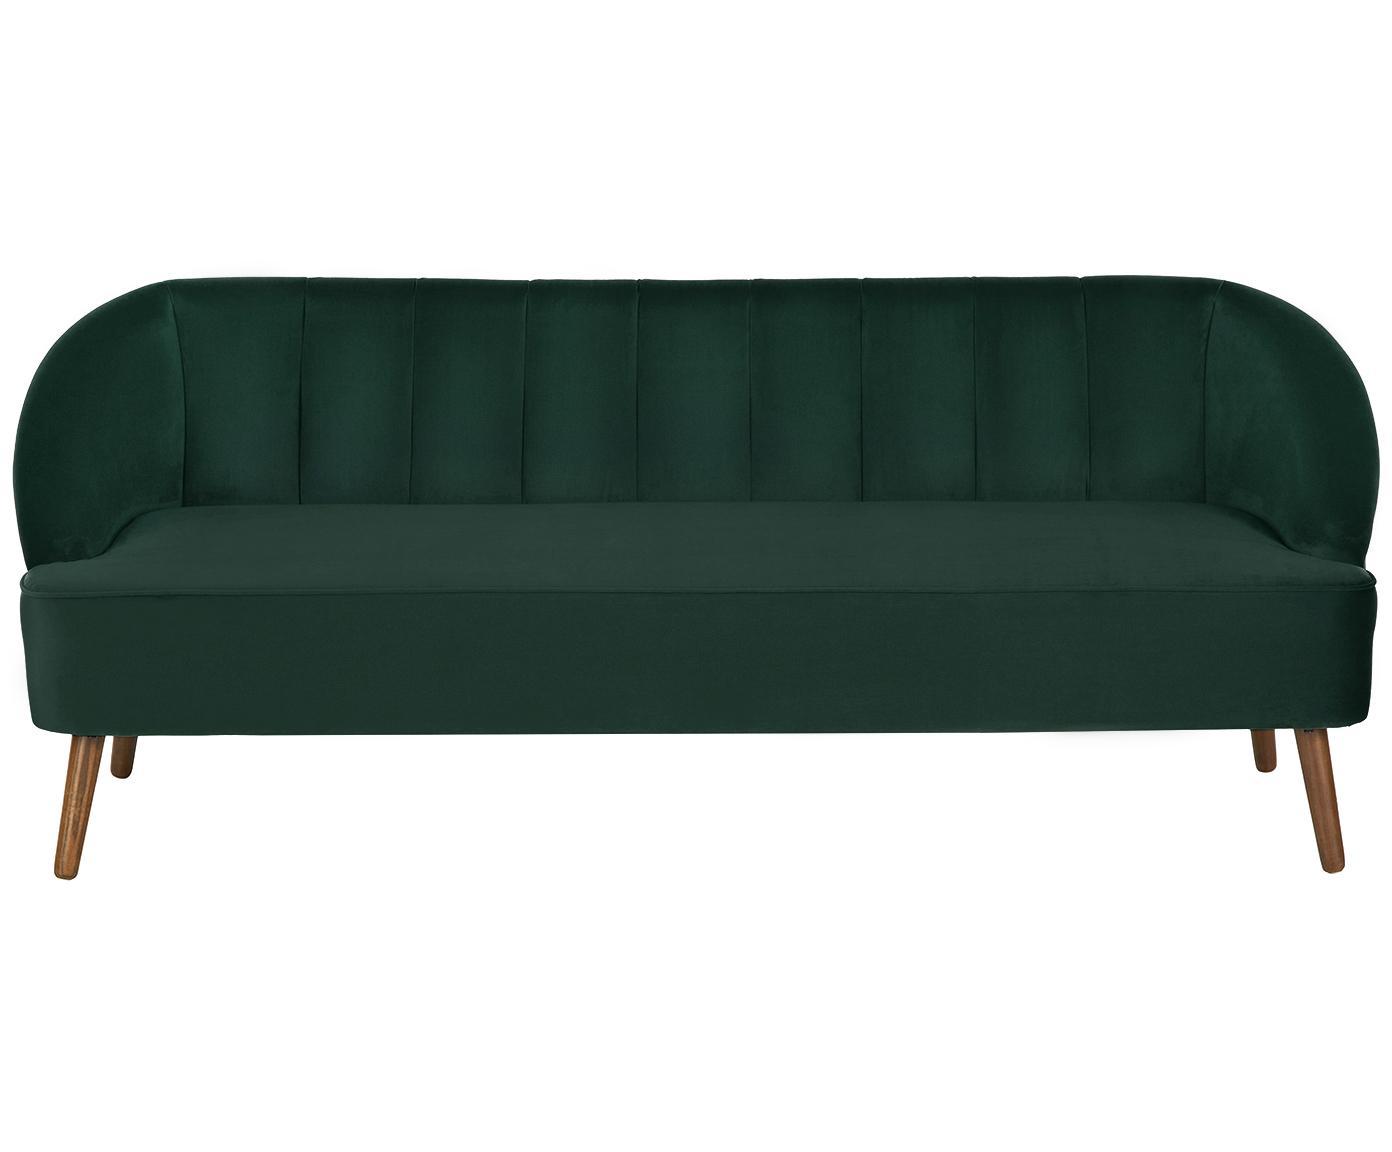 Samt-Sofa Cora (3-Sitzer), Bezug: Samt (Polyester) 28.000 S, Gestell: Kiefernholz, Füße: Kautschukholz, Samt Dunkelgrün, 192 x 74 cm